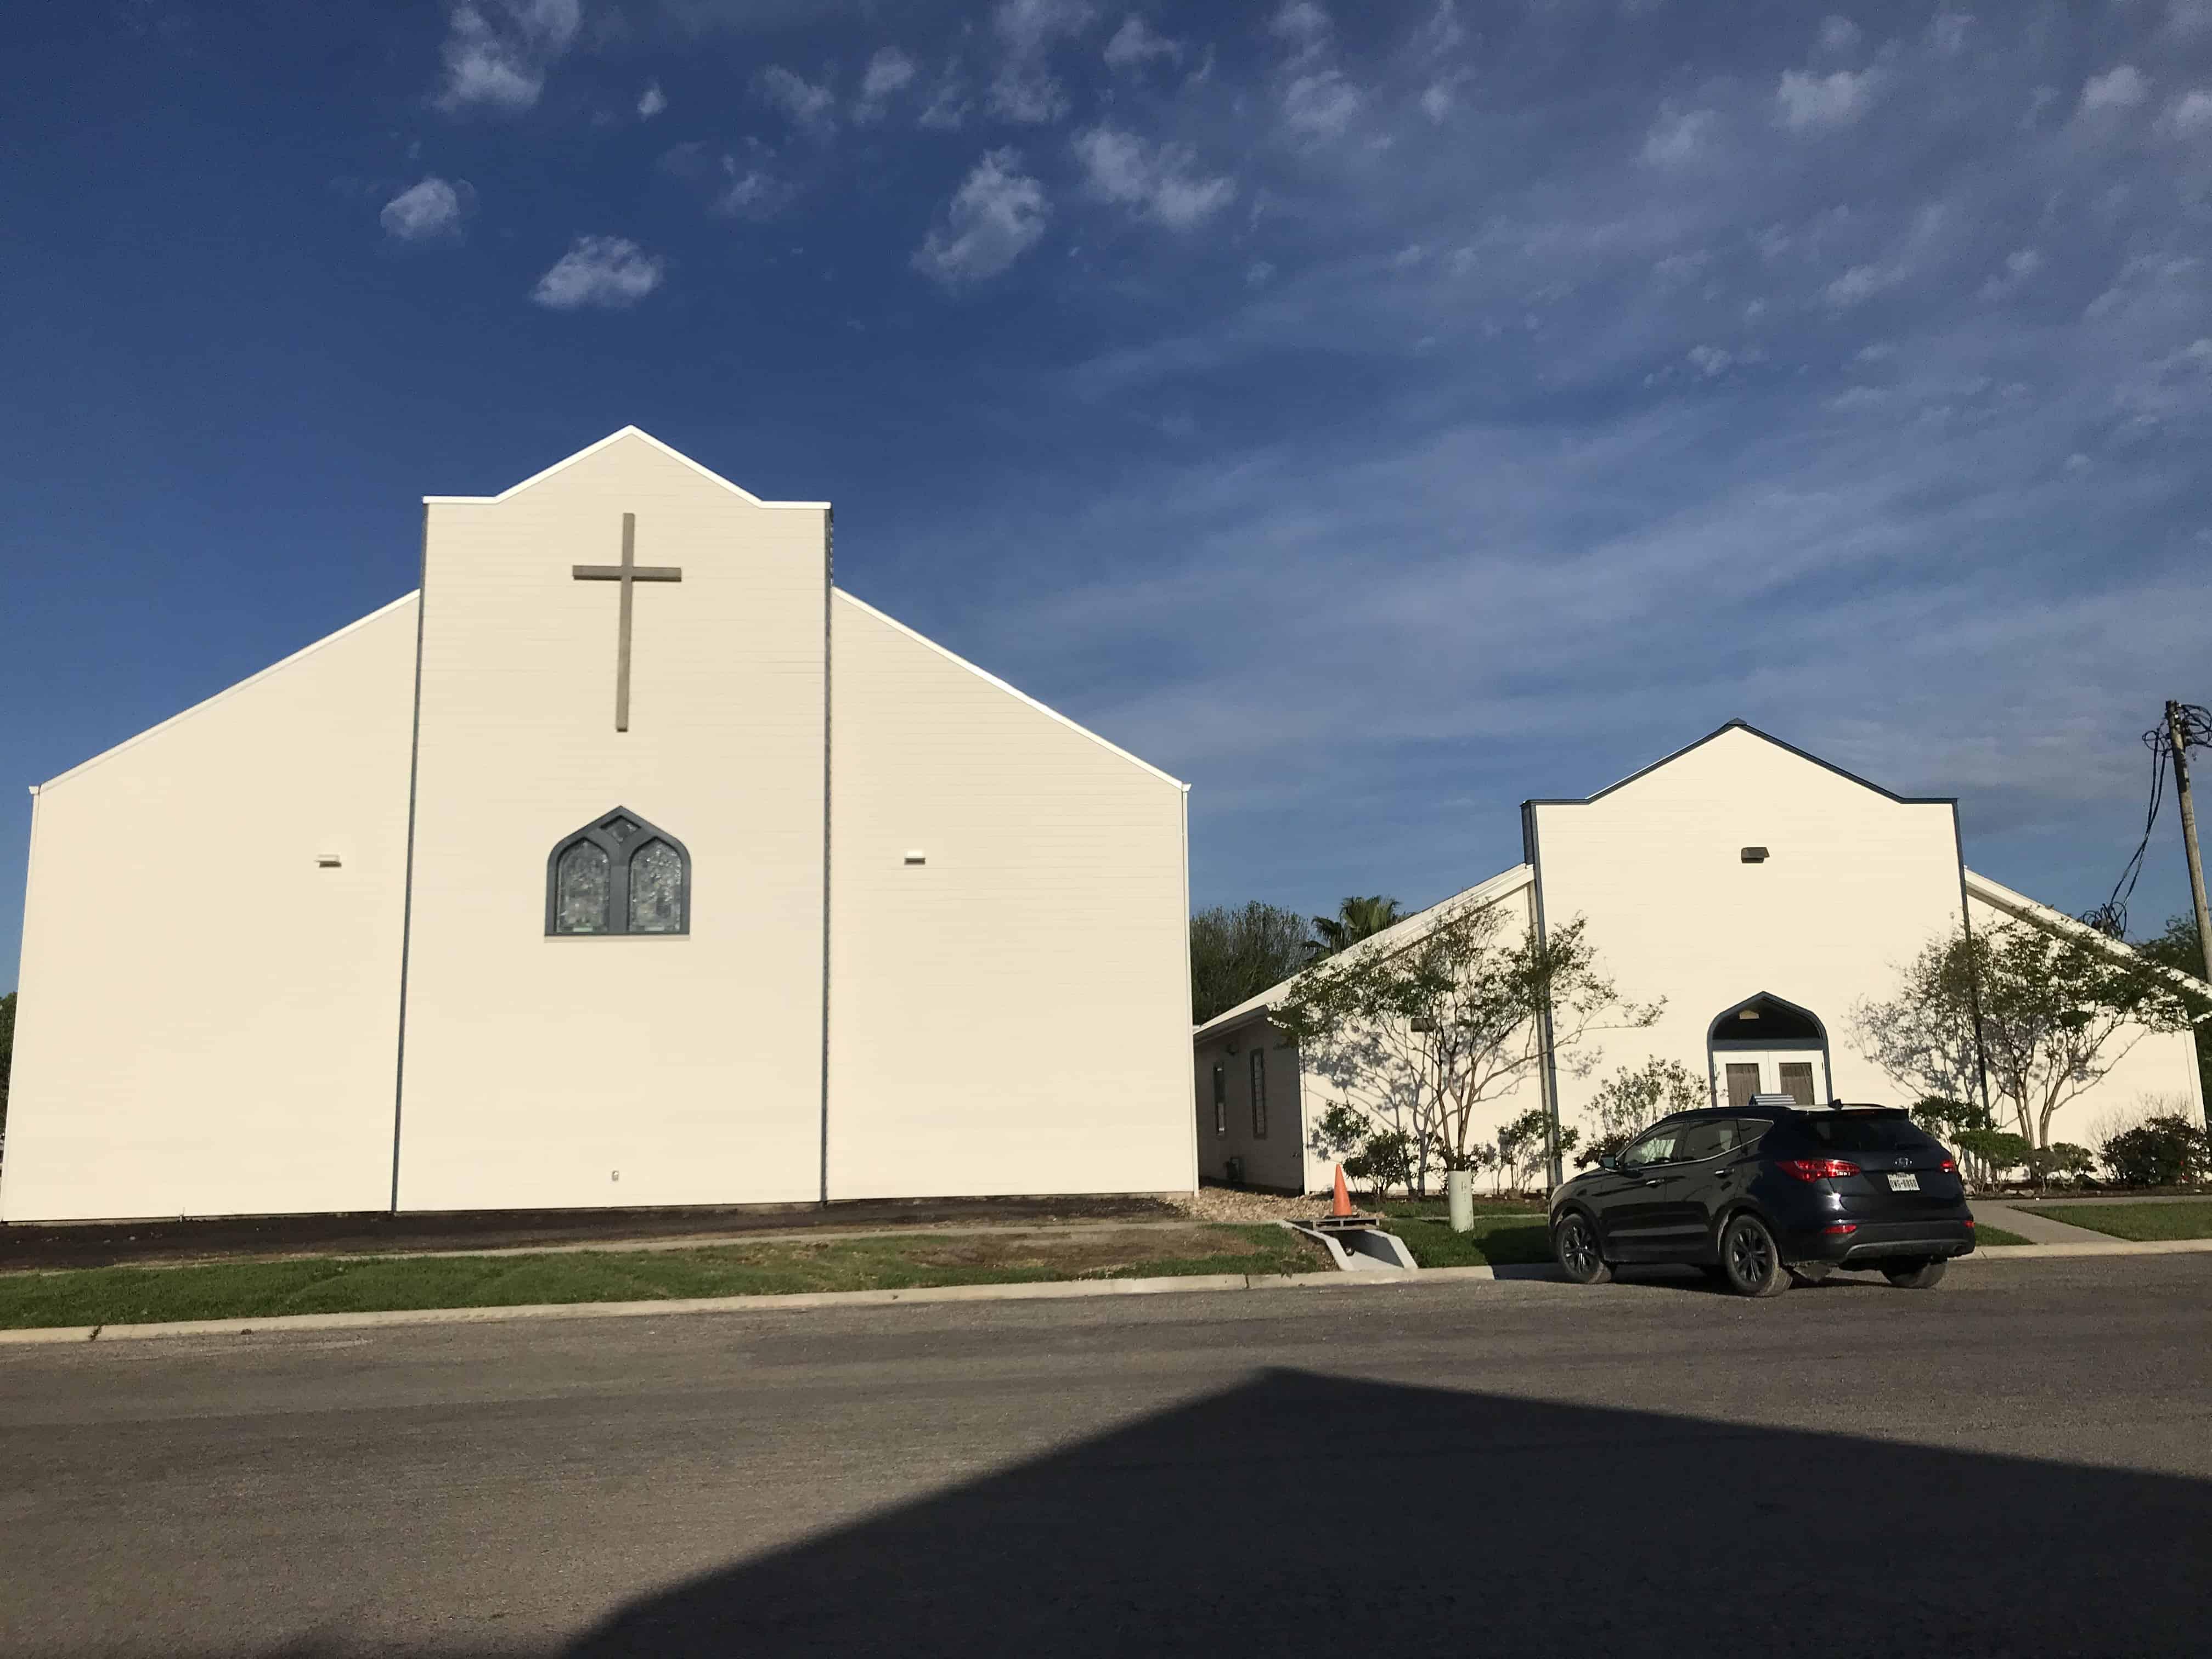 The United Methodist Church in Karnes City